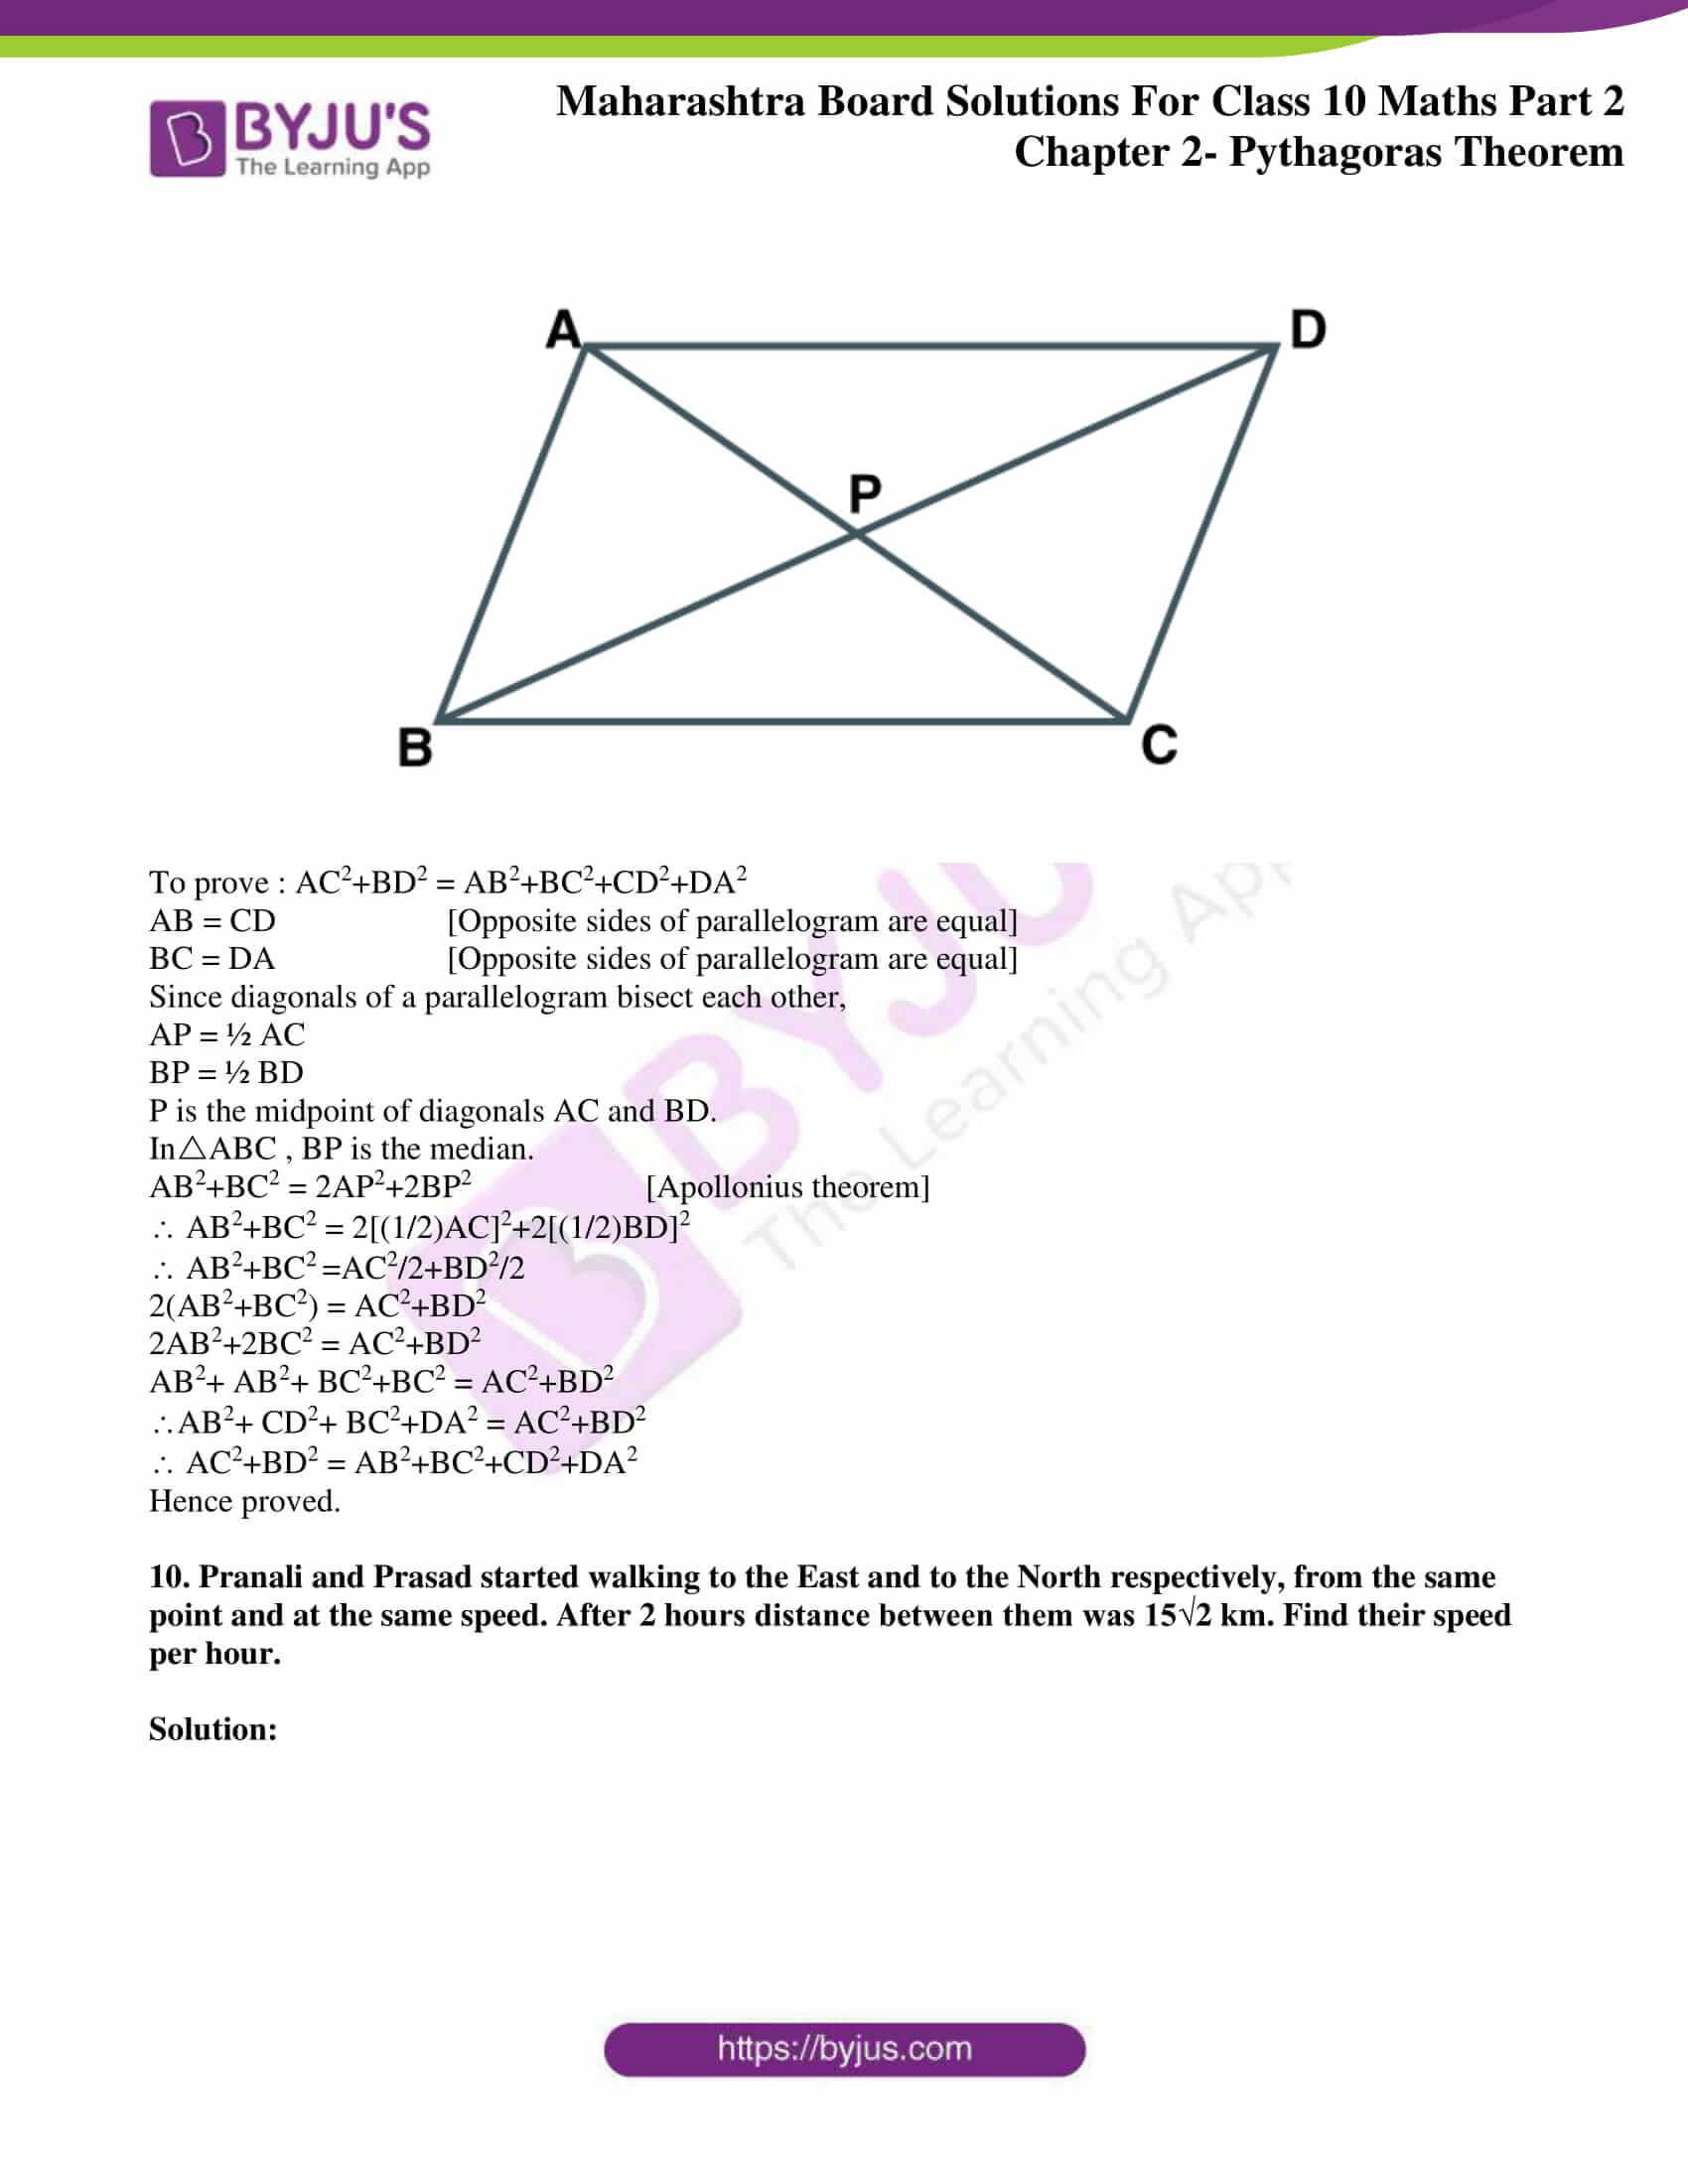 msbshse sol class 10 maths part 2 chapter 2 17